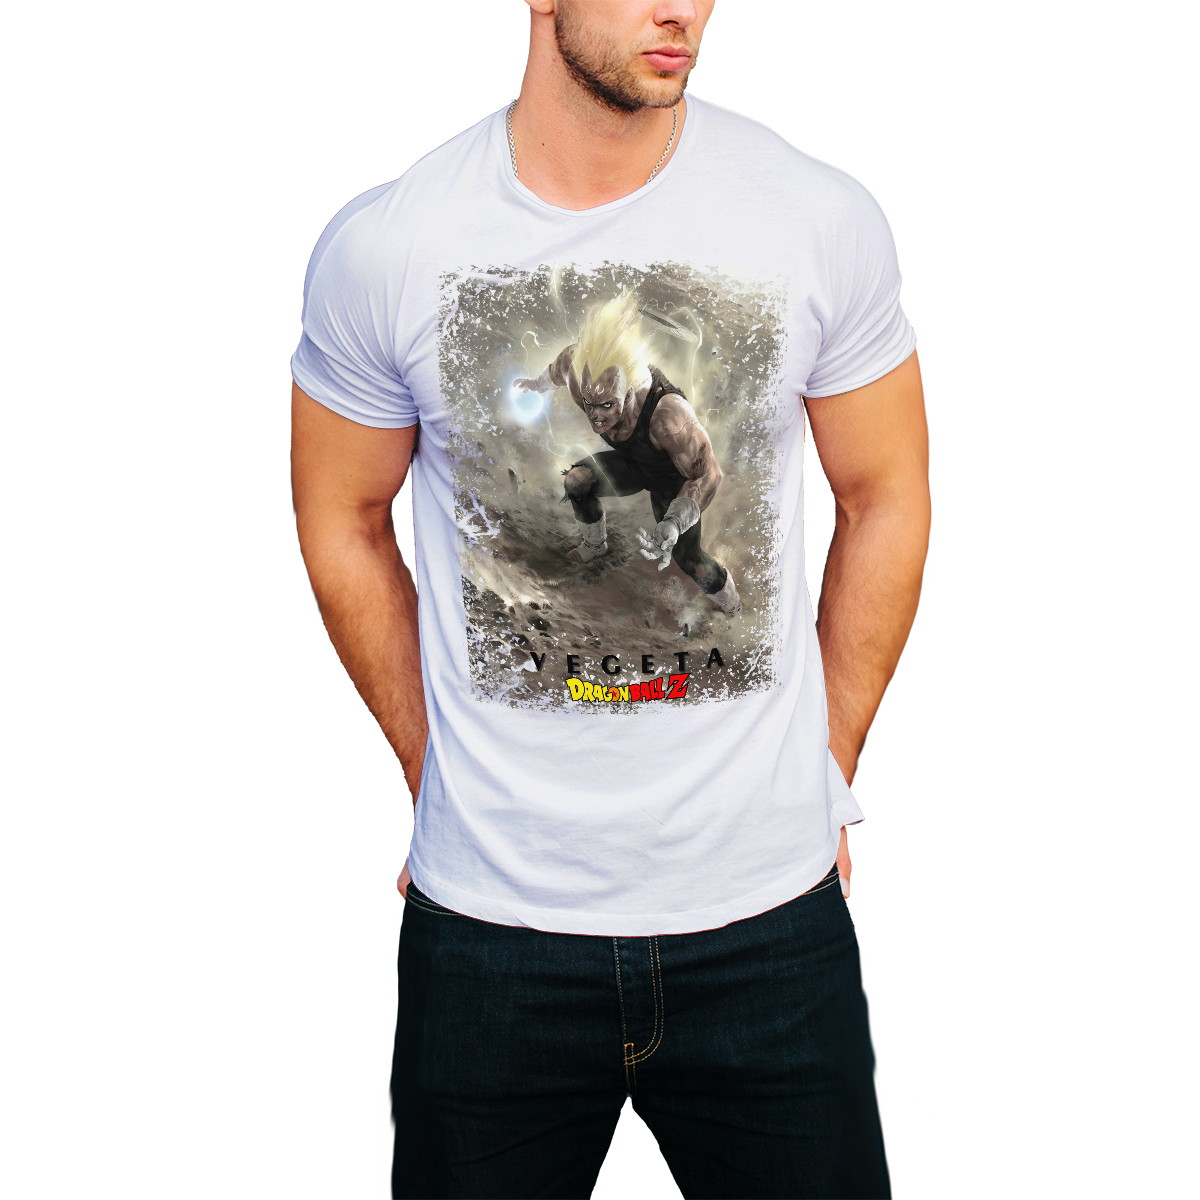 6f3a14691 Camiseta Dragon Ball Z Desenho Vegeta Anime Camisa Masculina no Elo7 ...